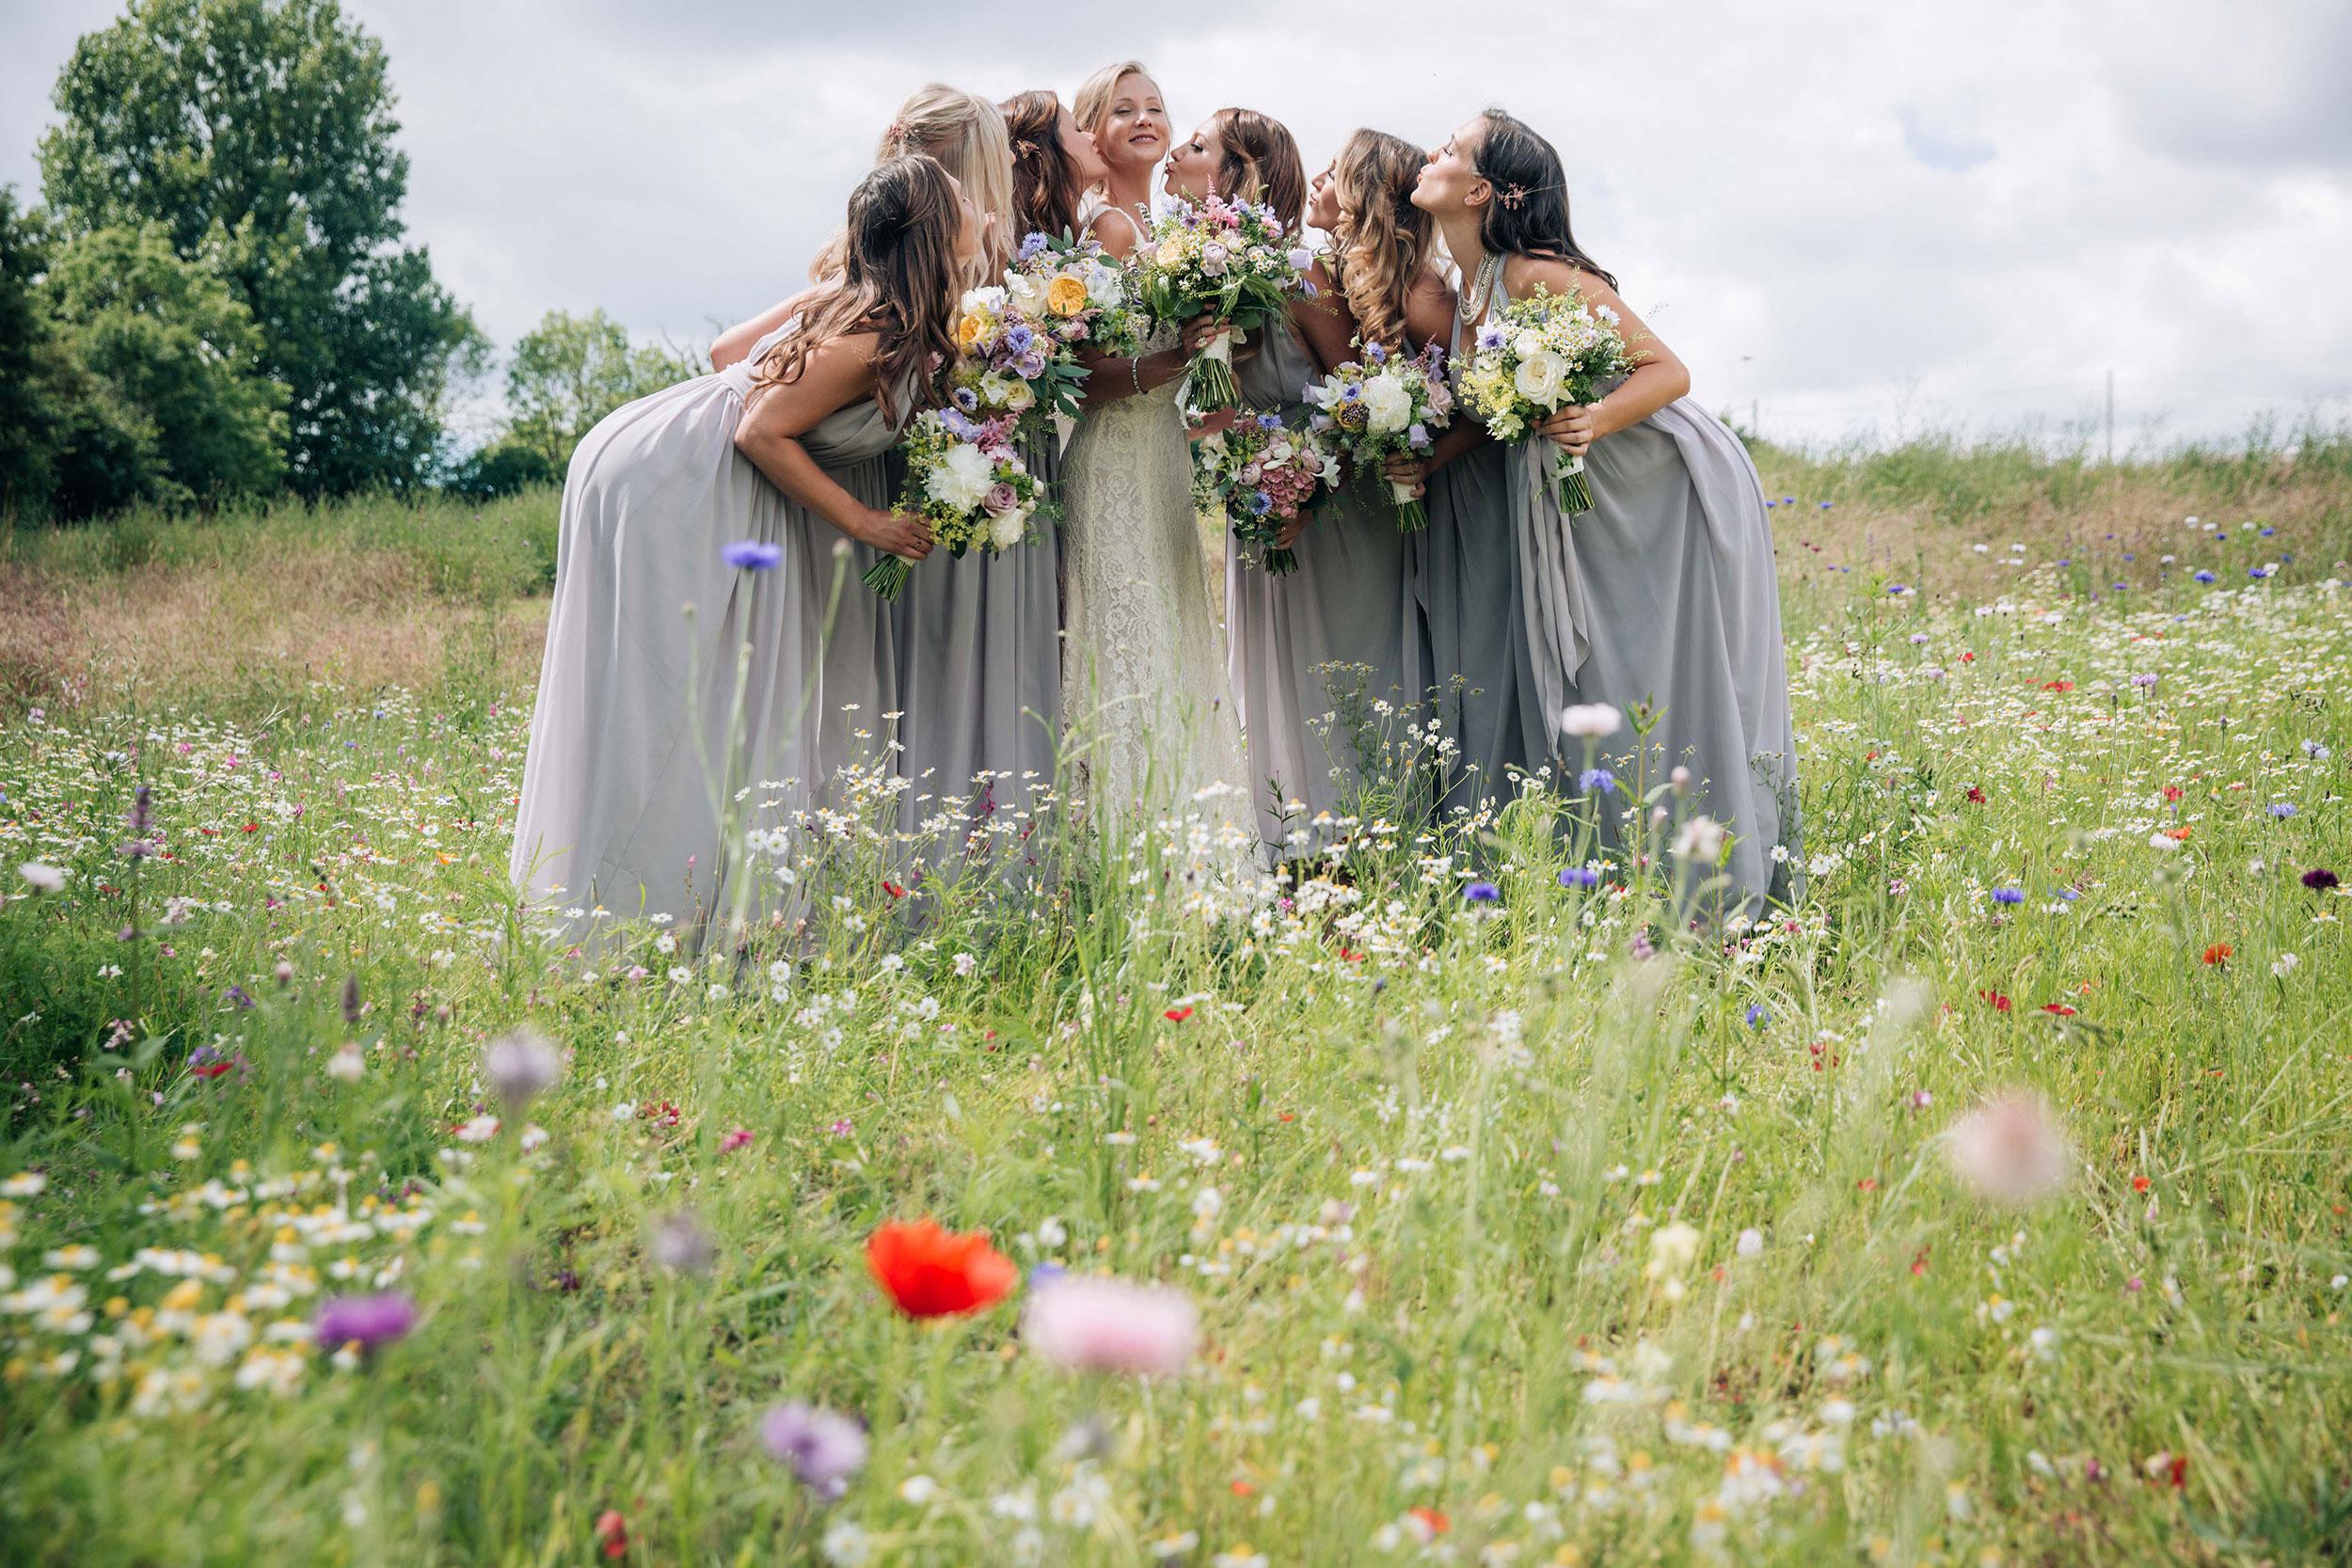 16.07.16-Tanya-&-Jethro-Wedding-Selection-39.jpg